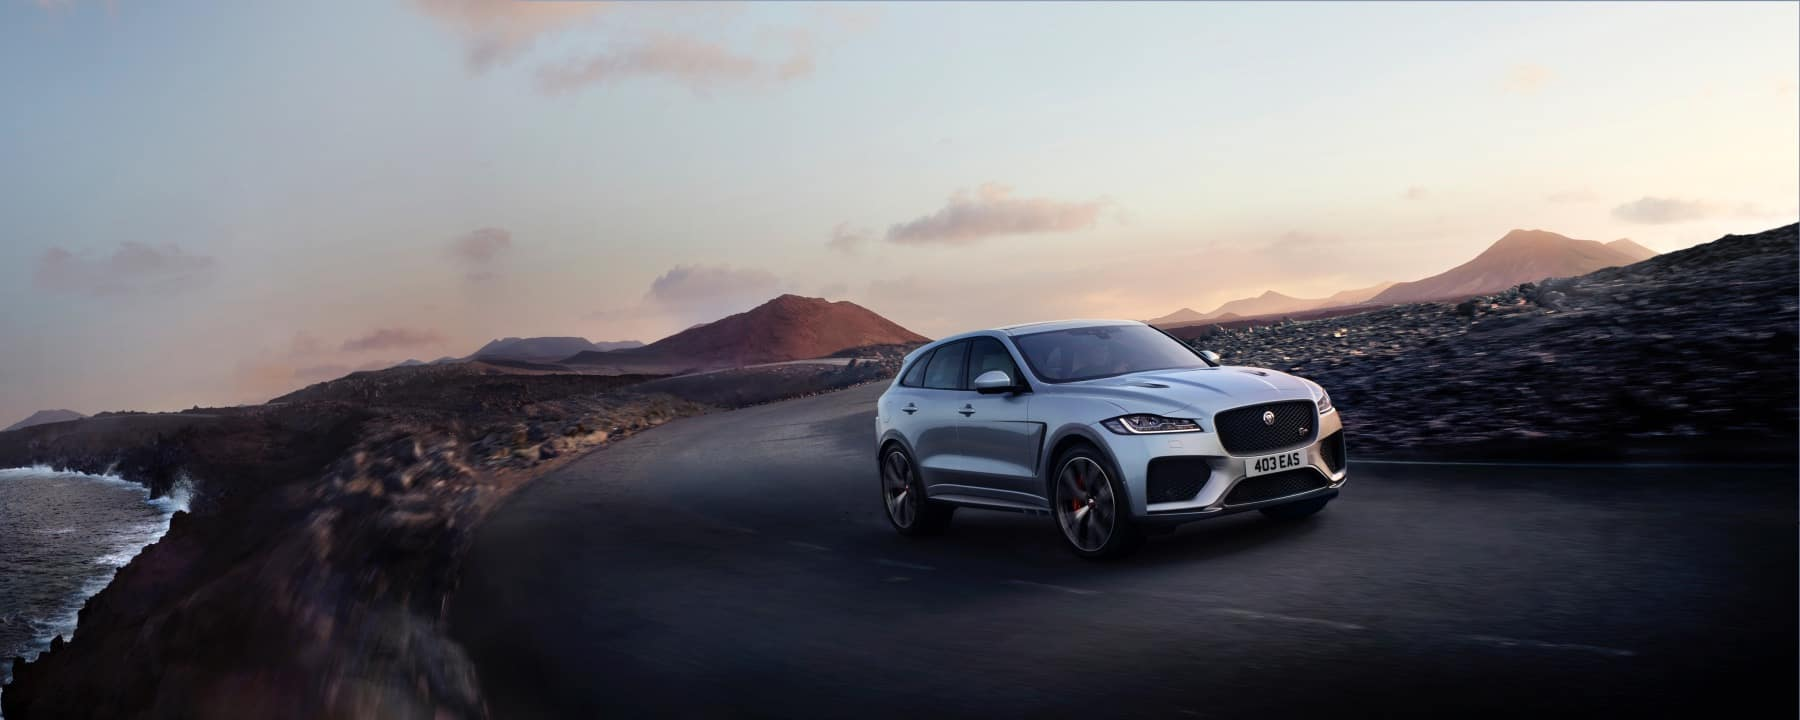 Jaguar-F-TYPE SVR